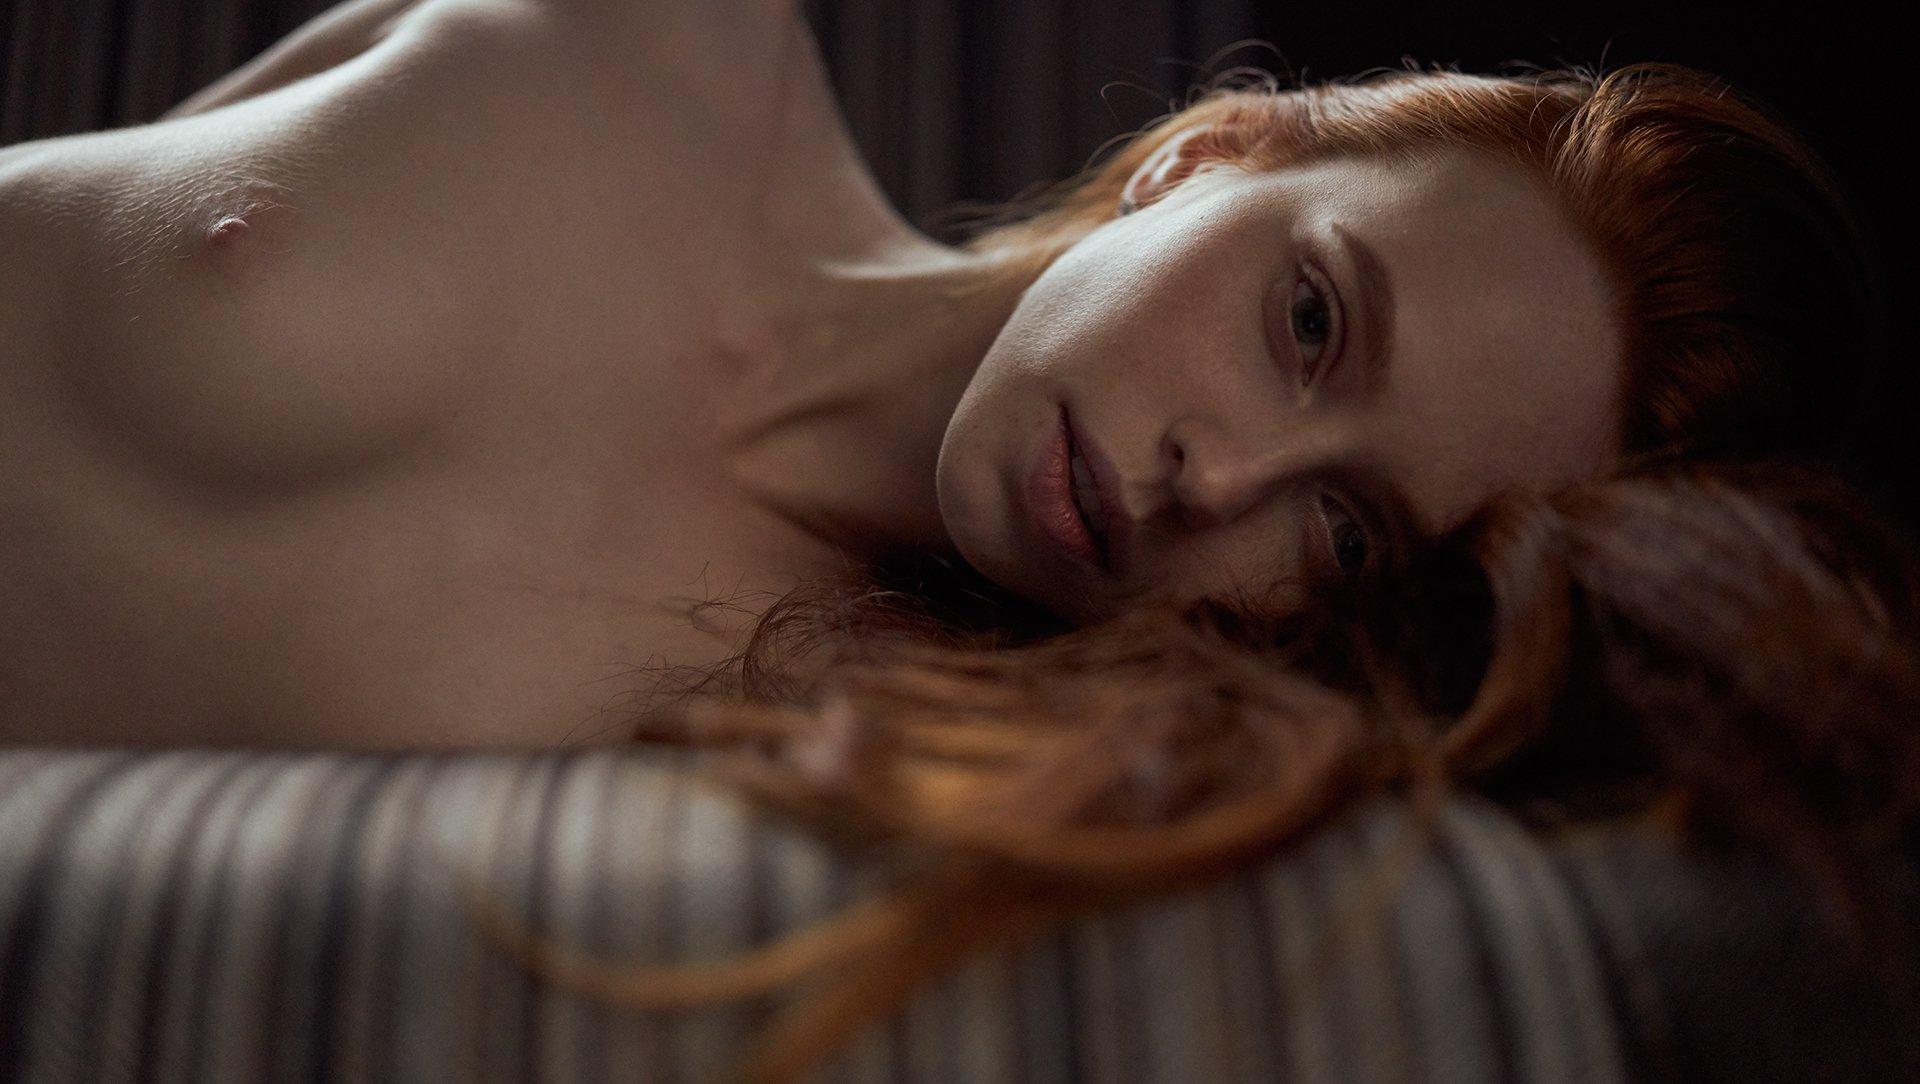 girl, at home, natural light, nude, ginger, nice, face, red, red hair, beautiful, model, Роман Филиппов